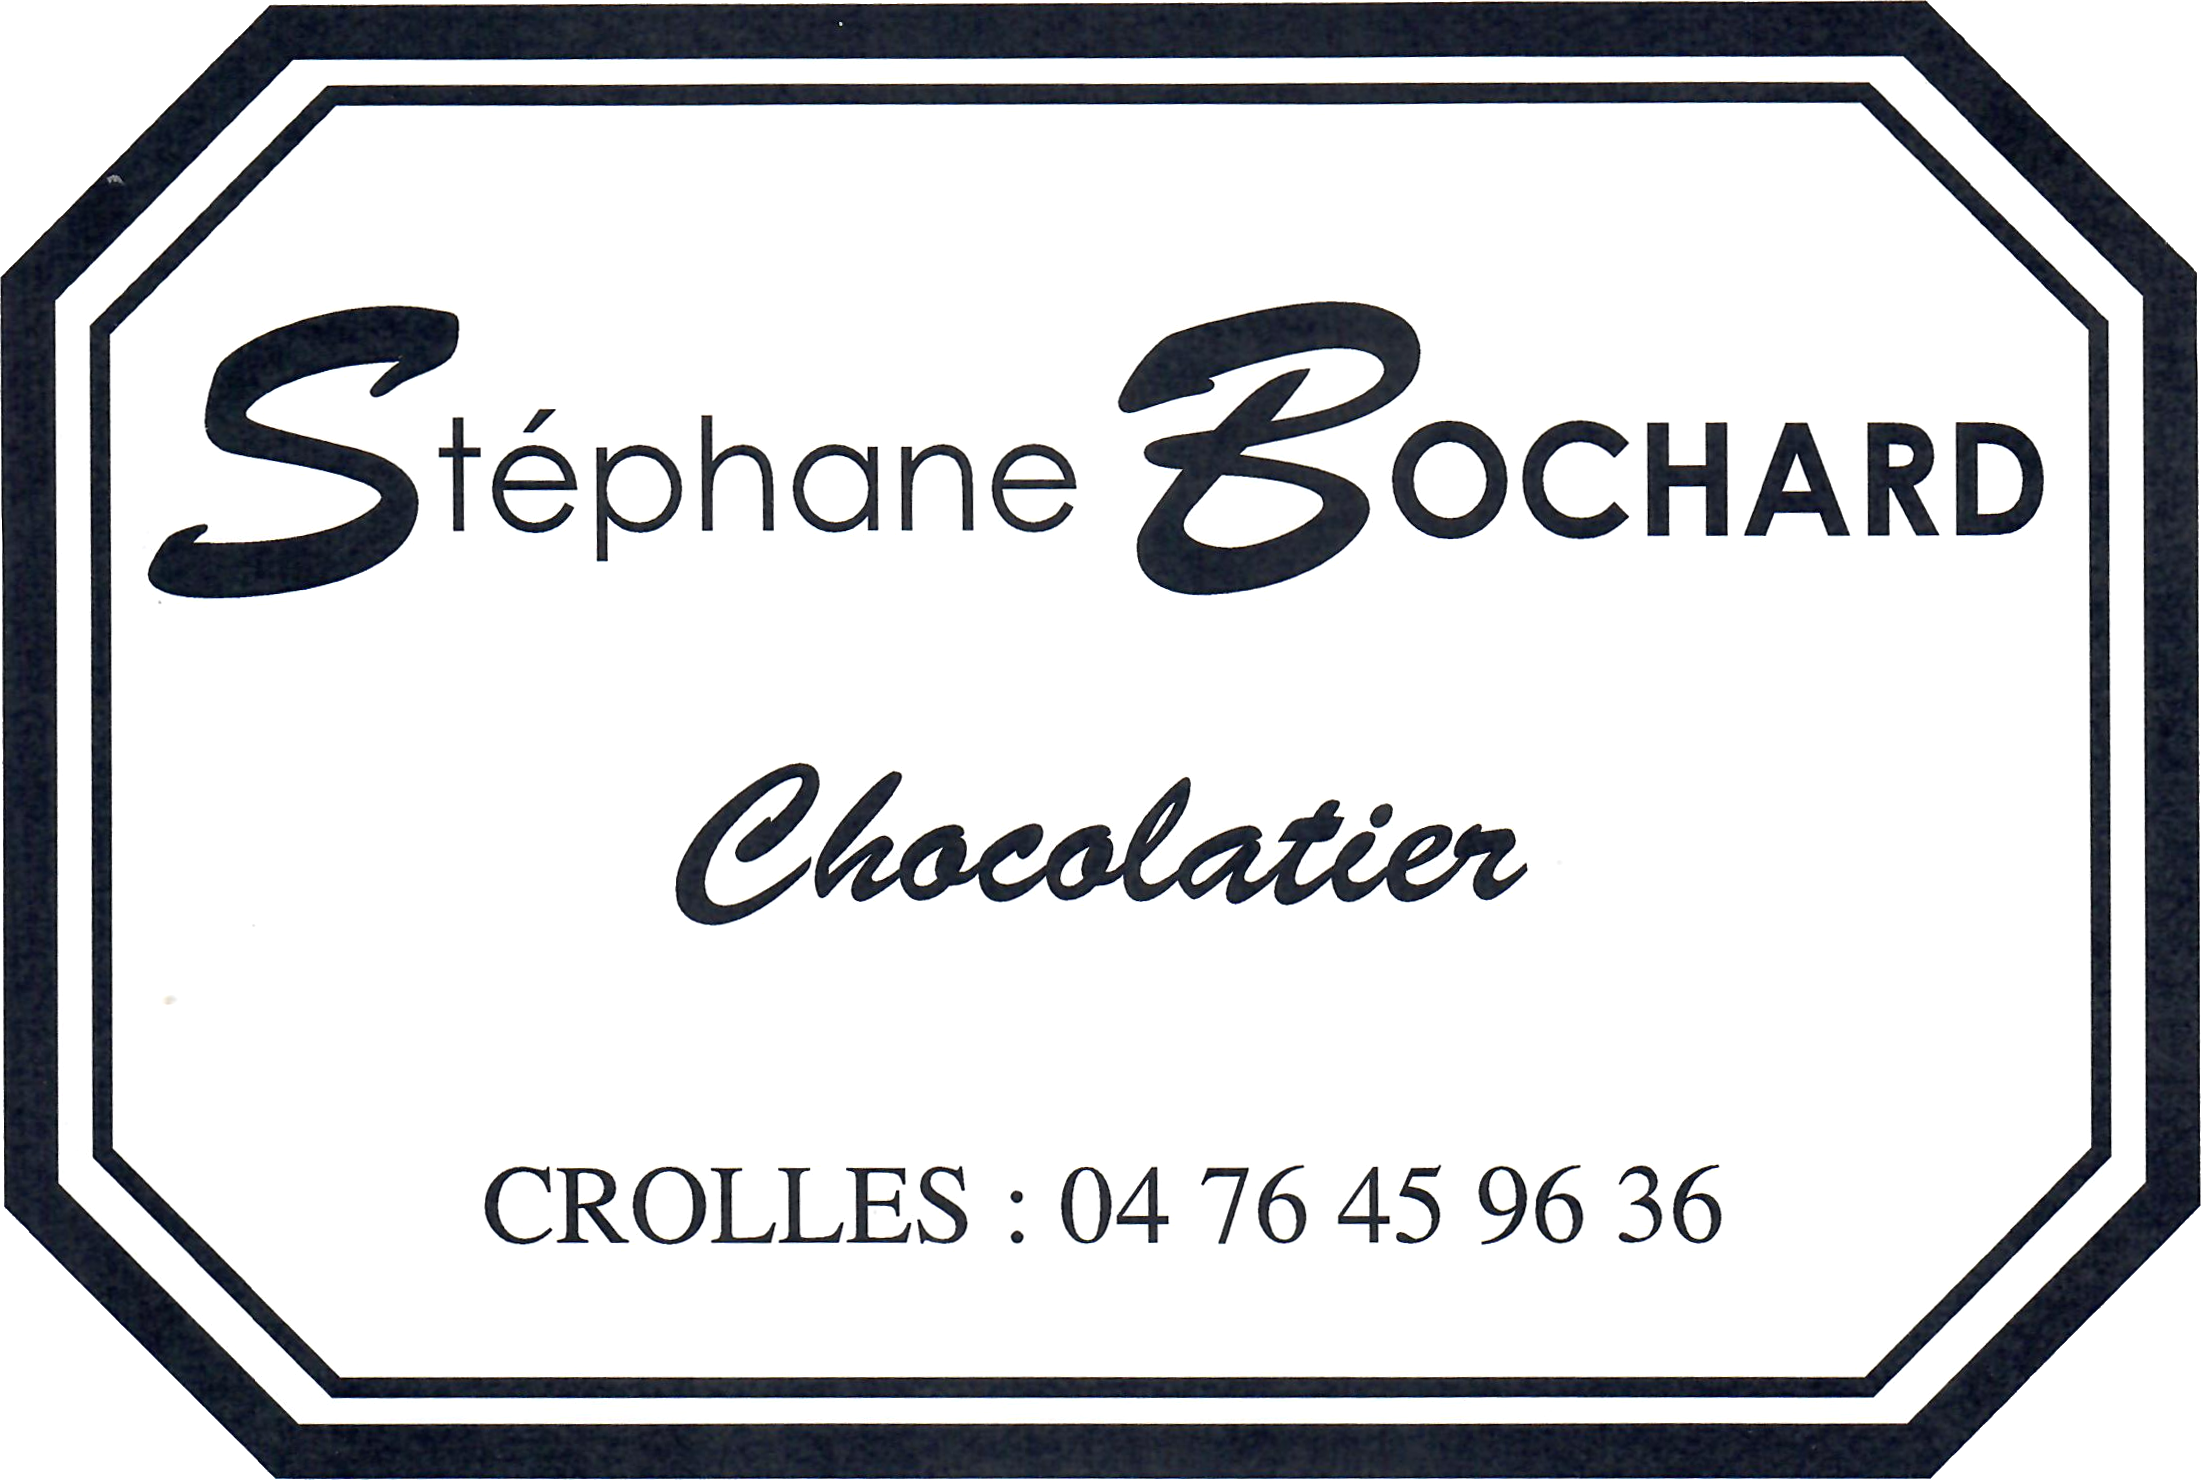 Chocolaterie Stéphane Bochard